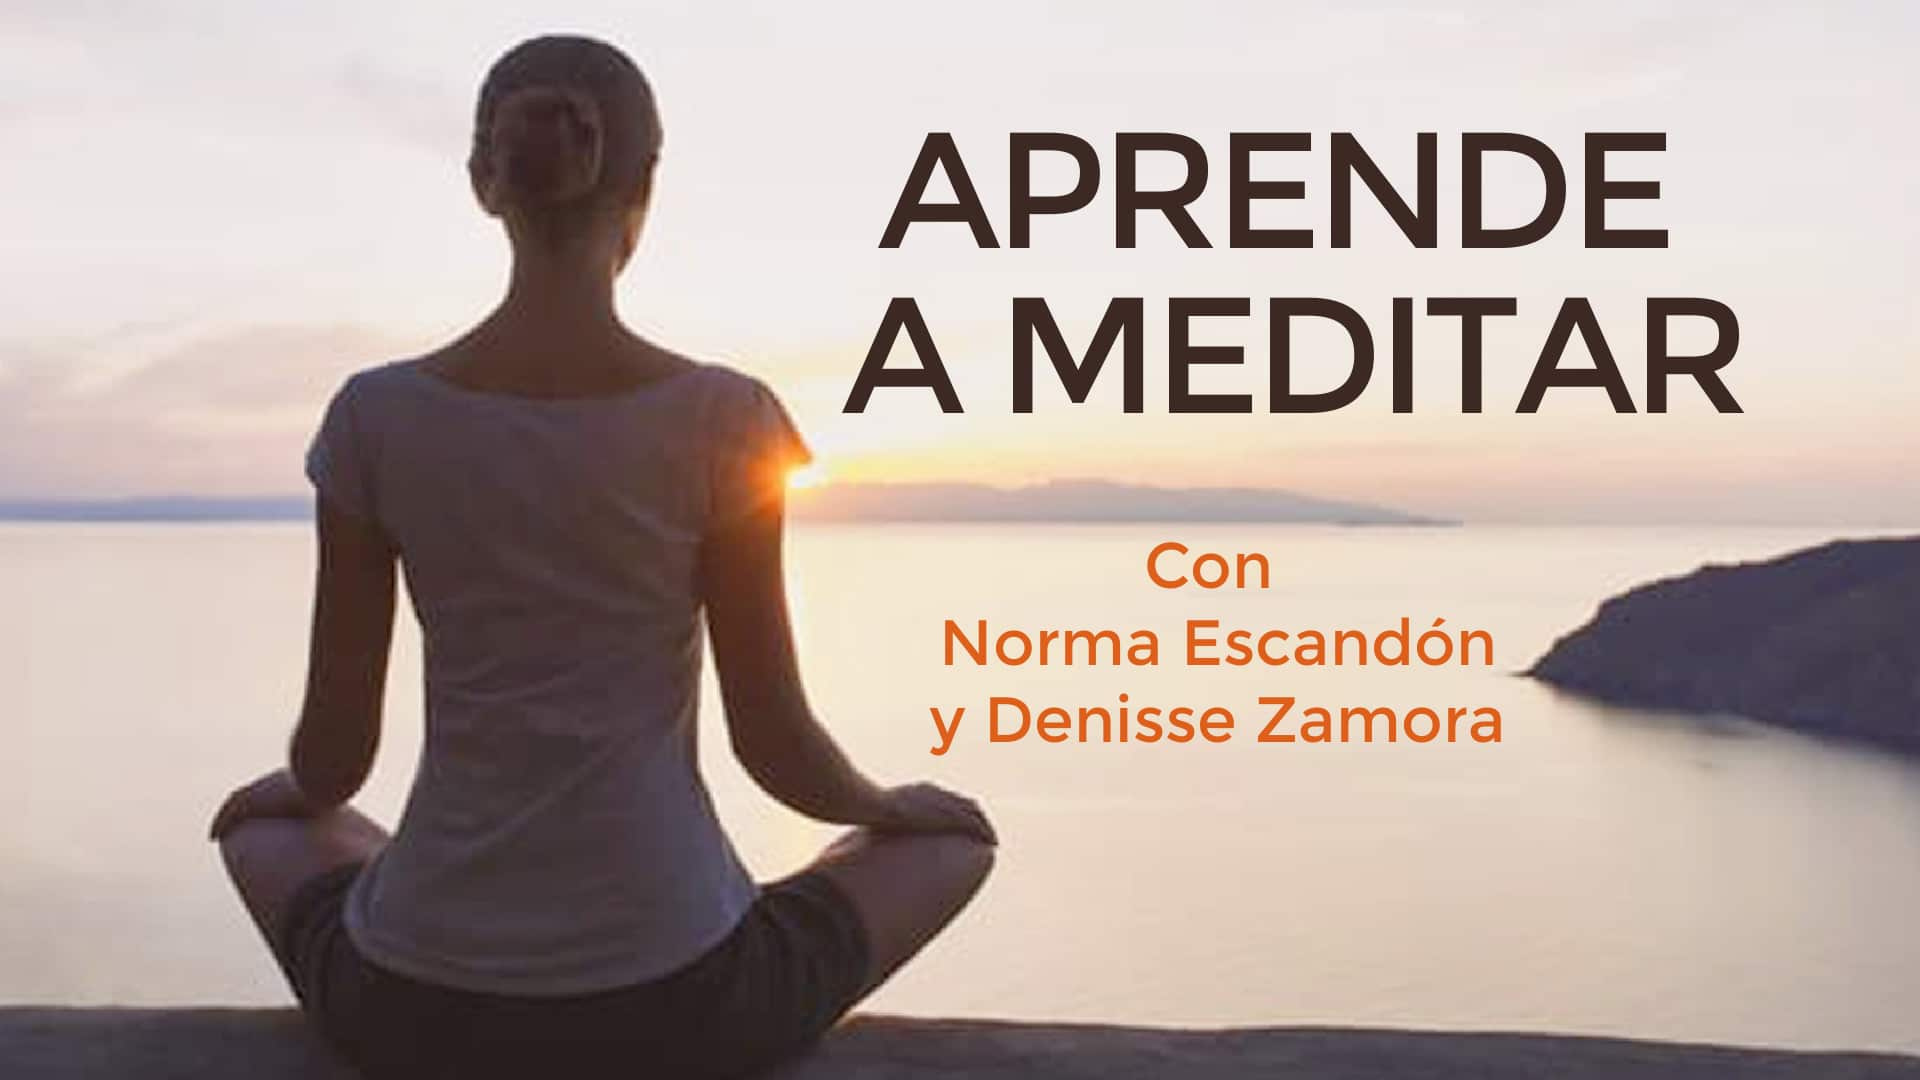 En este momento estás viendo Aprende a meditar